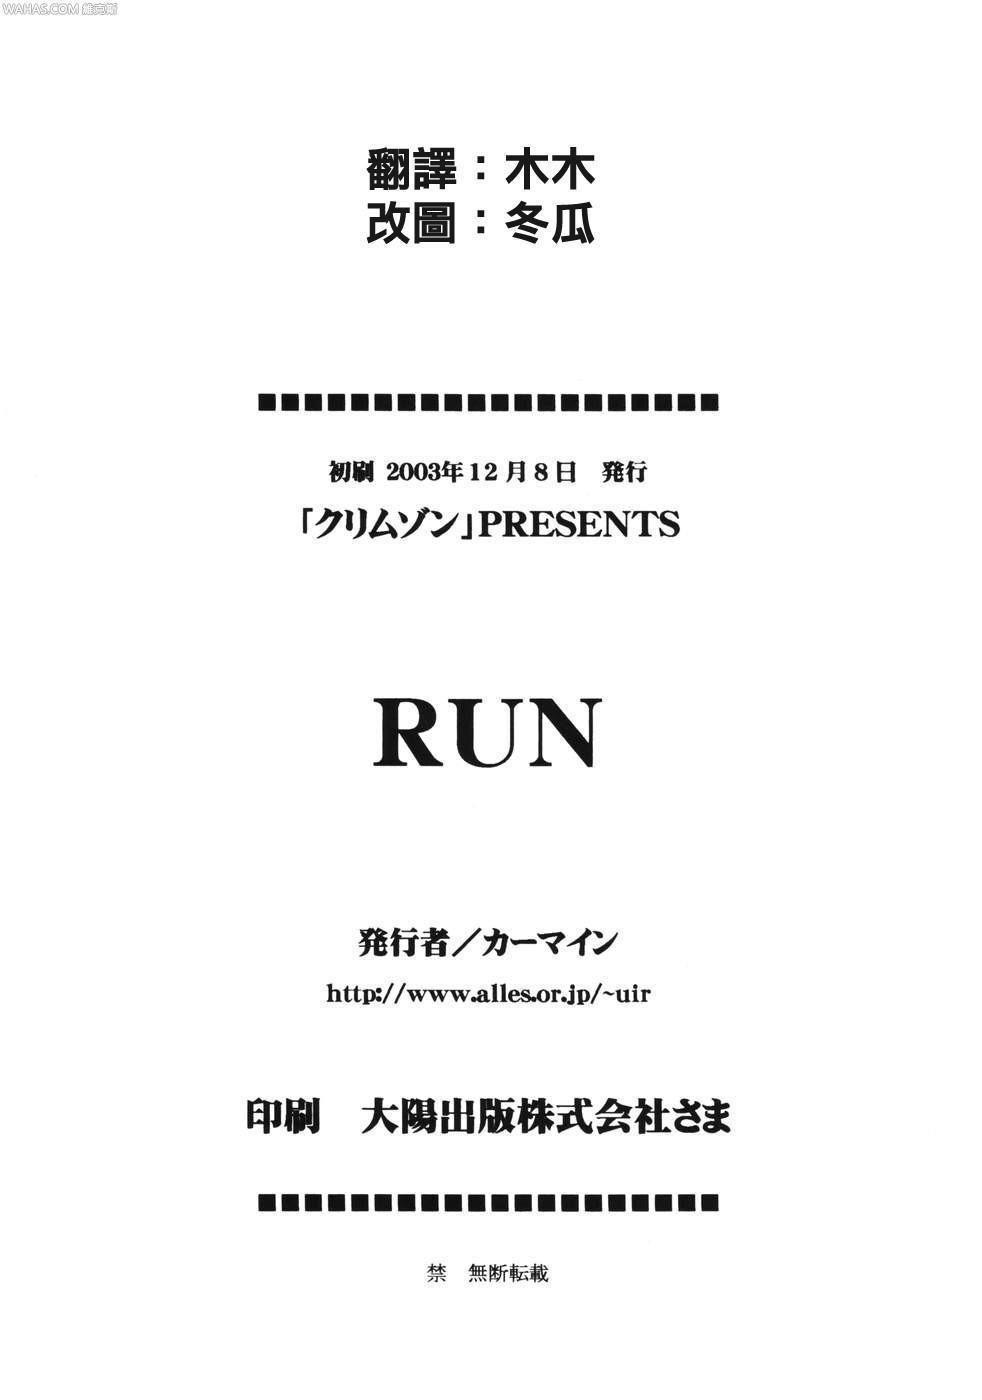 Dancing Animation Run 100